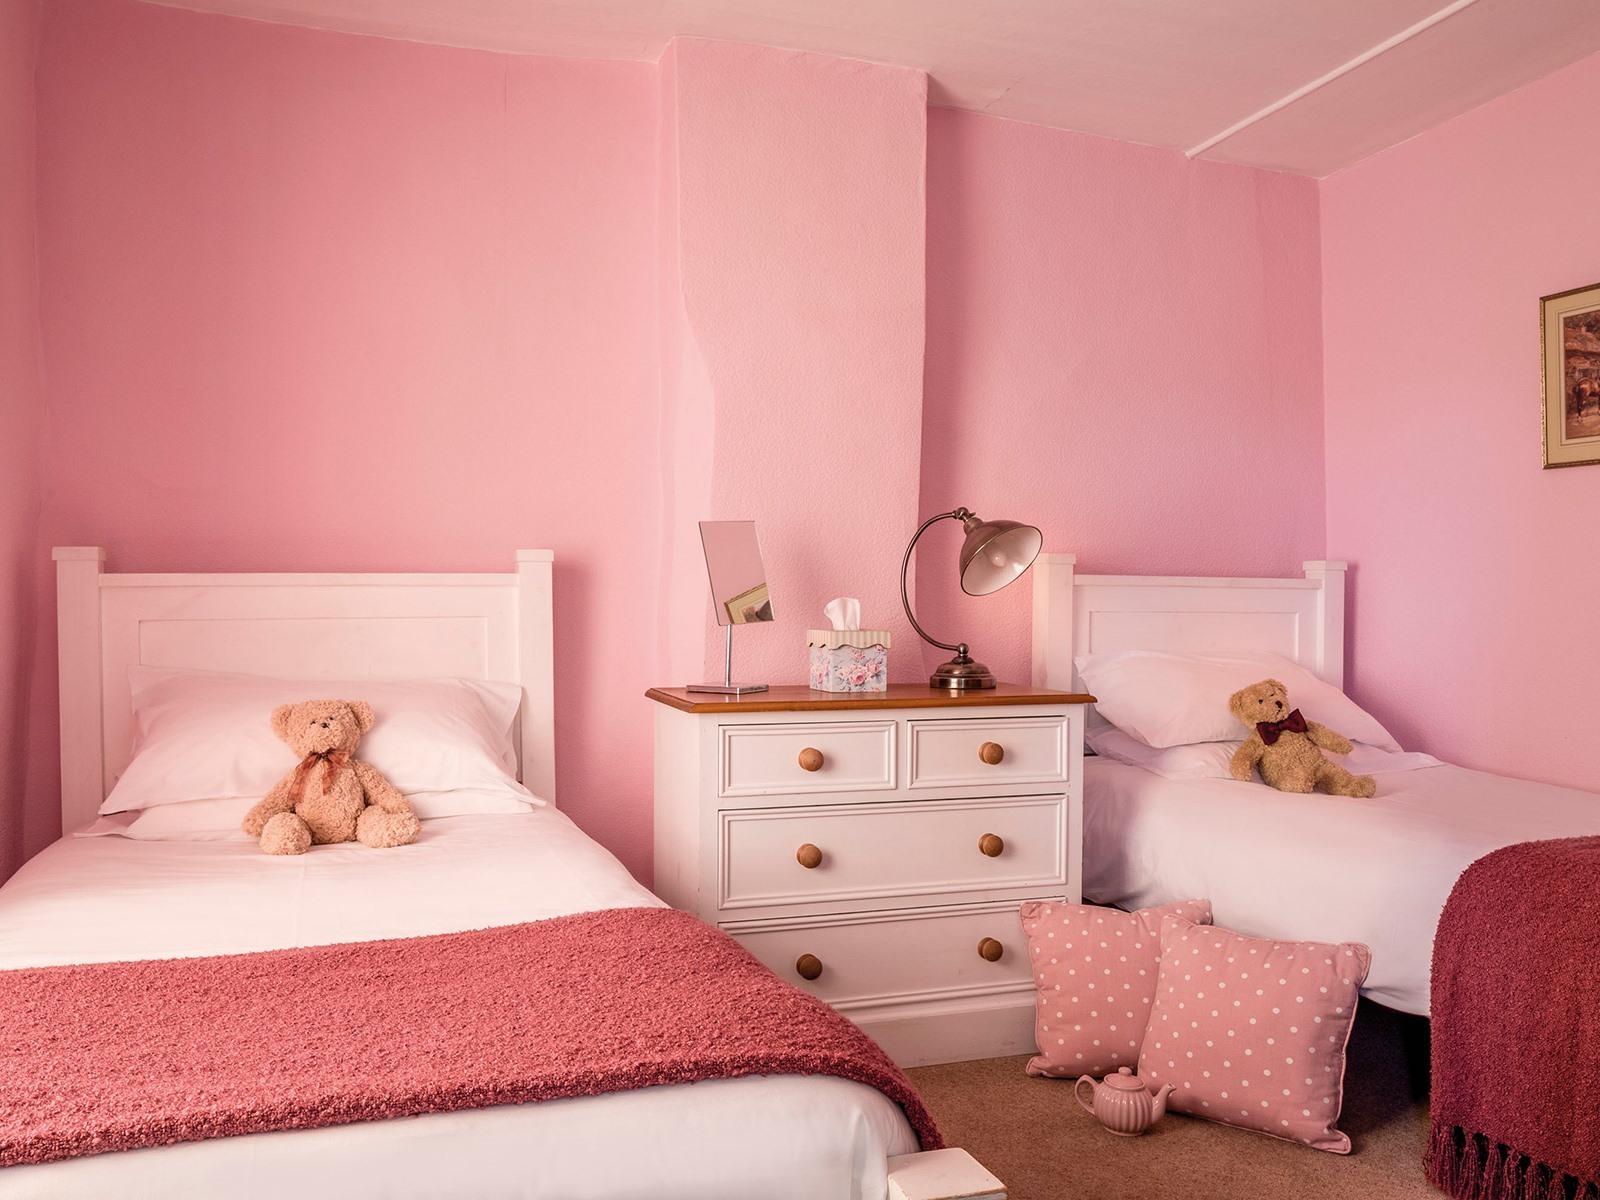 Sheepwash - Twin room, Ensuite